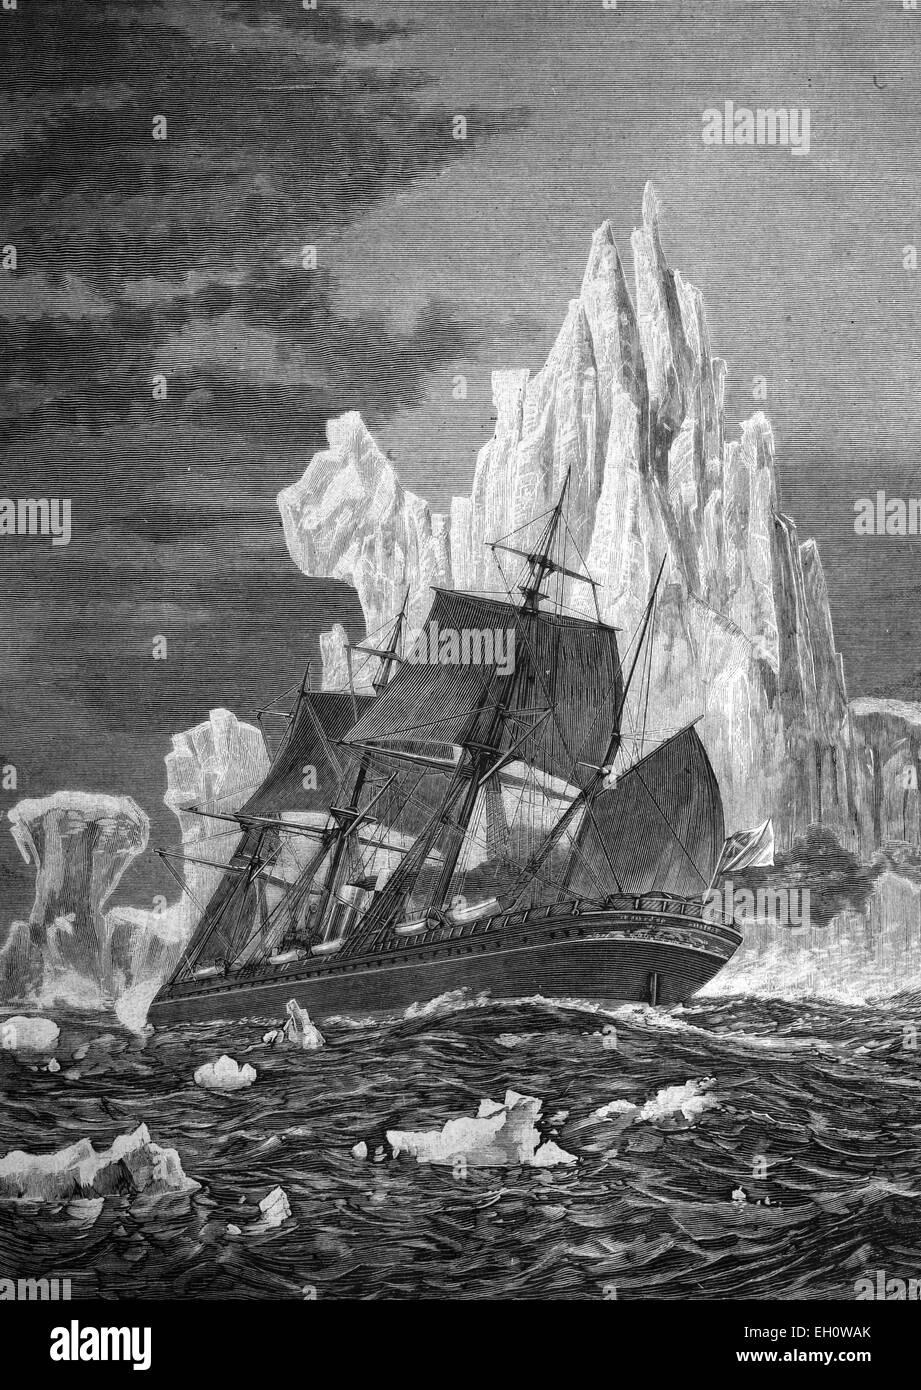 Sailing ship facing an iceberg, historical illustration, about 1886 - Stock Image